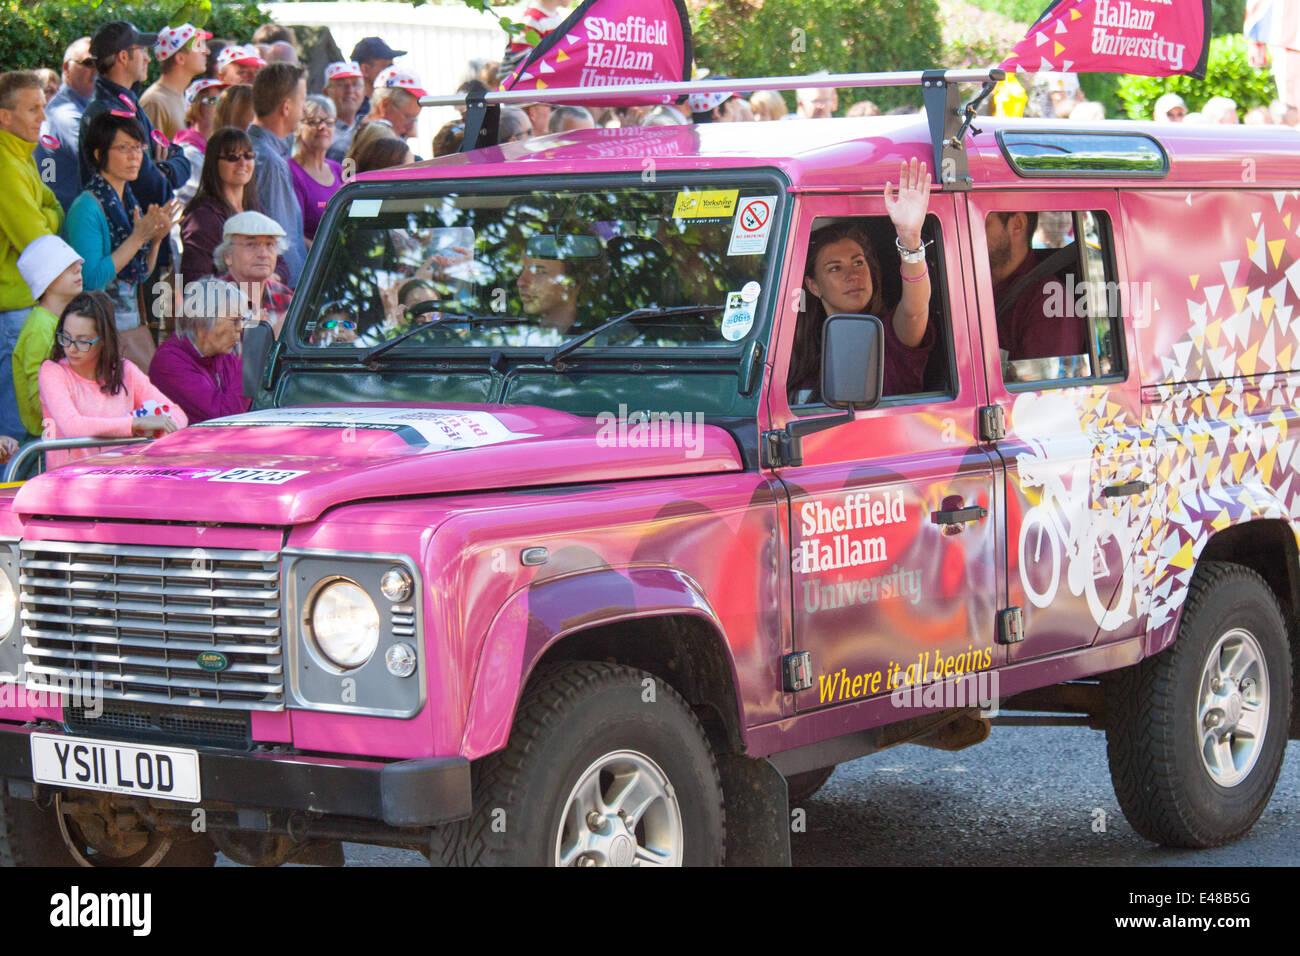 Land Rover für Sheffield Hallam University vor der Tour de France in Harrogate Stockbild